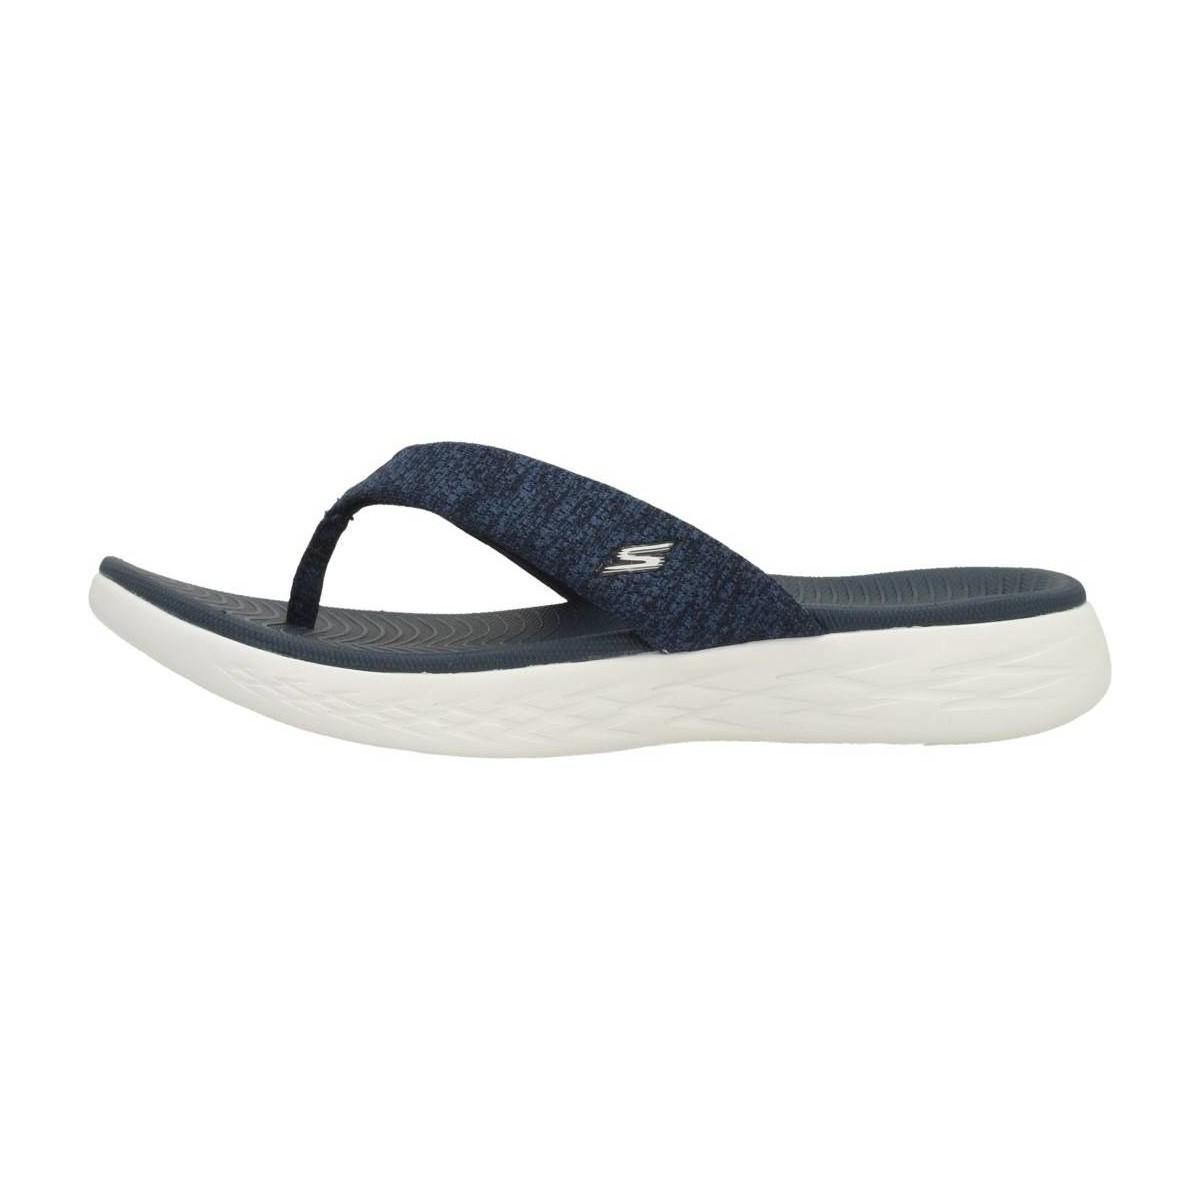 9d8911d9b800 Skechers - On The Go 600 Preferred Women s Flip Flops   Sandals (shoes) In.  View Fullscreen